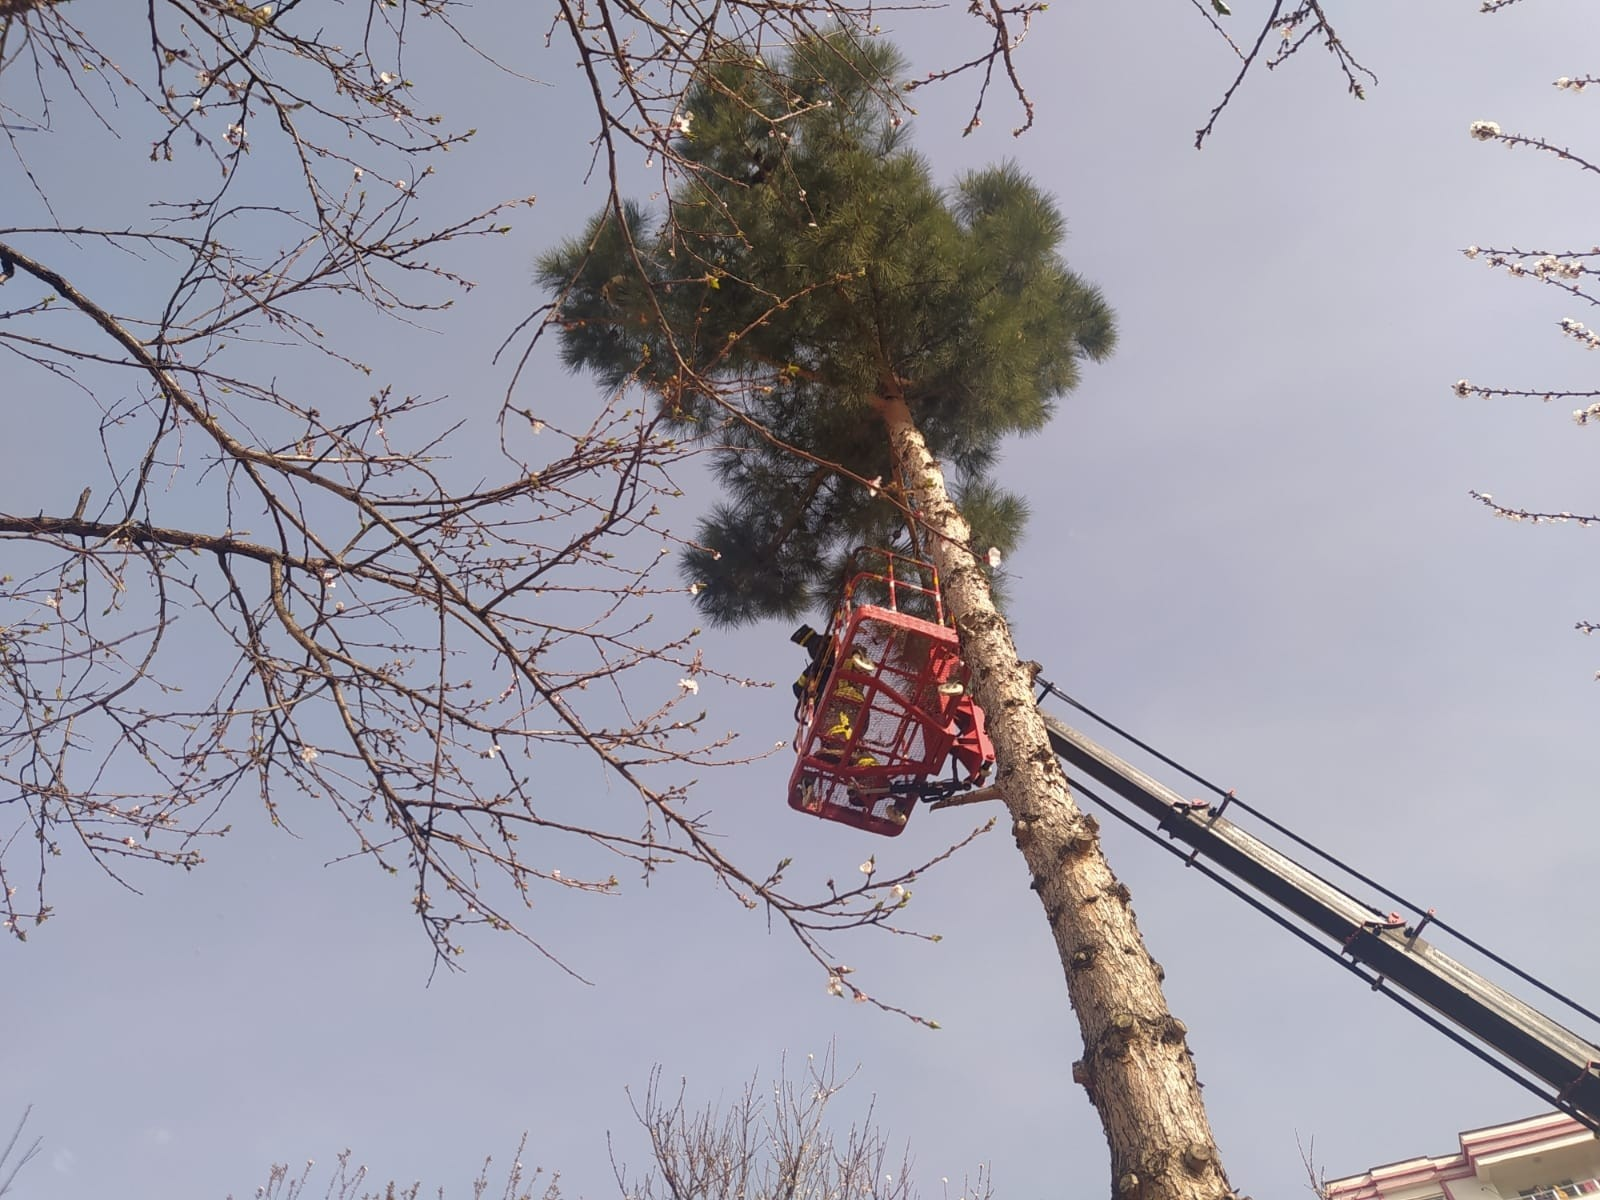 Siirt'te ağaçta mahsur kalan kediyi itfaiye ekipleri kurtardı